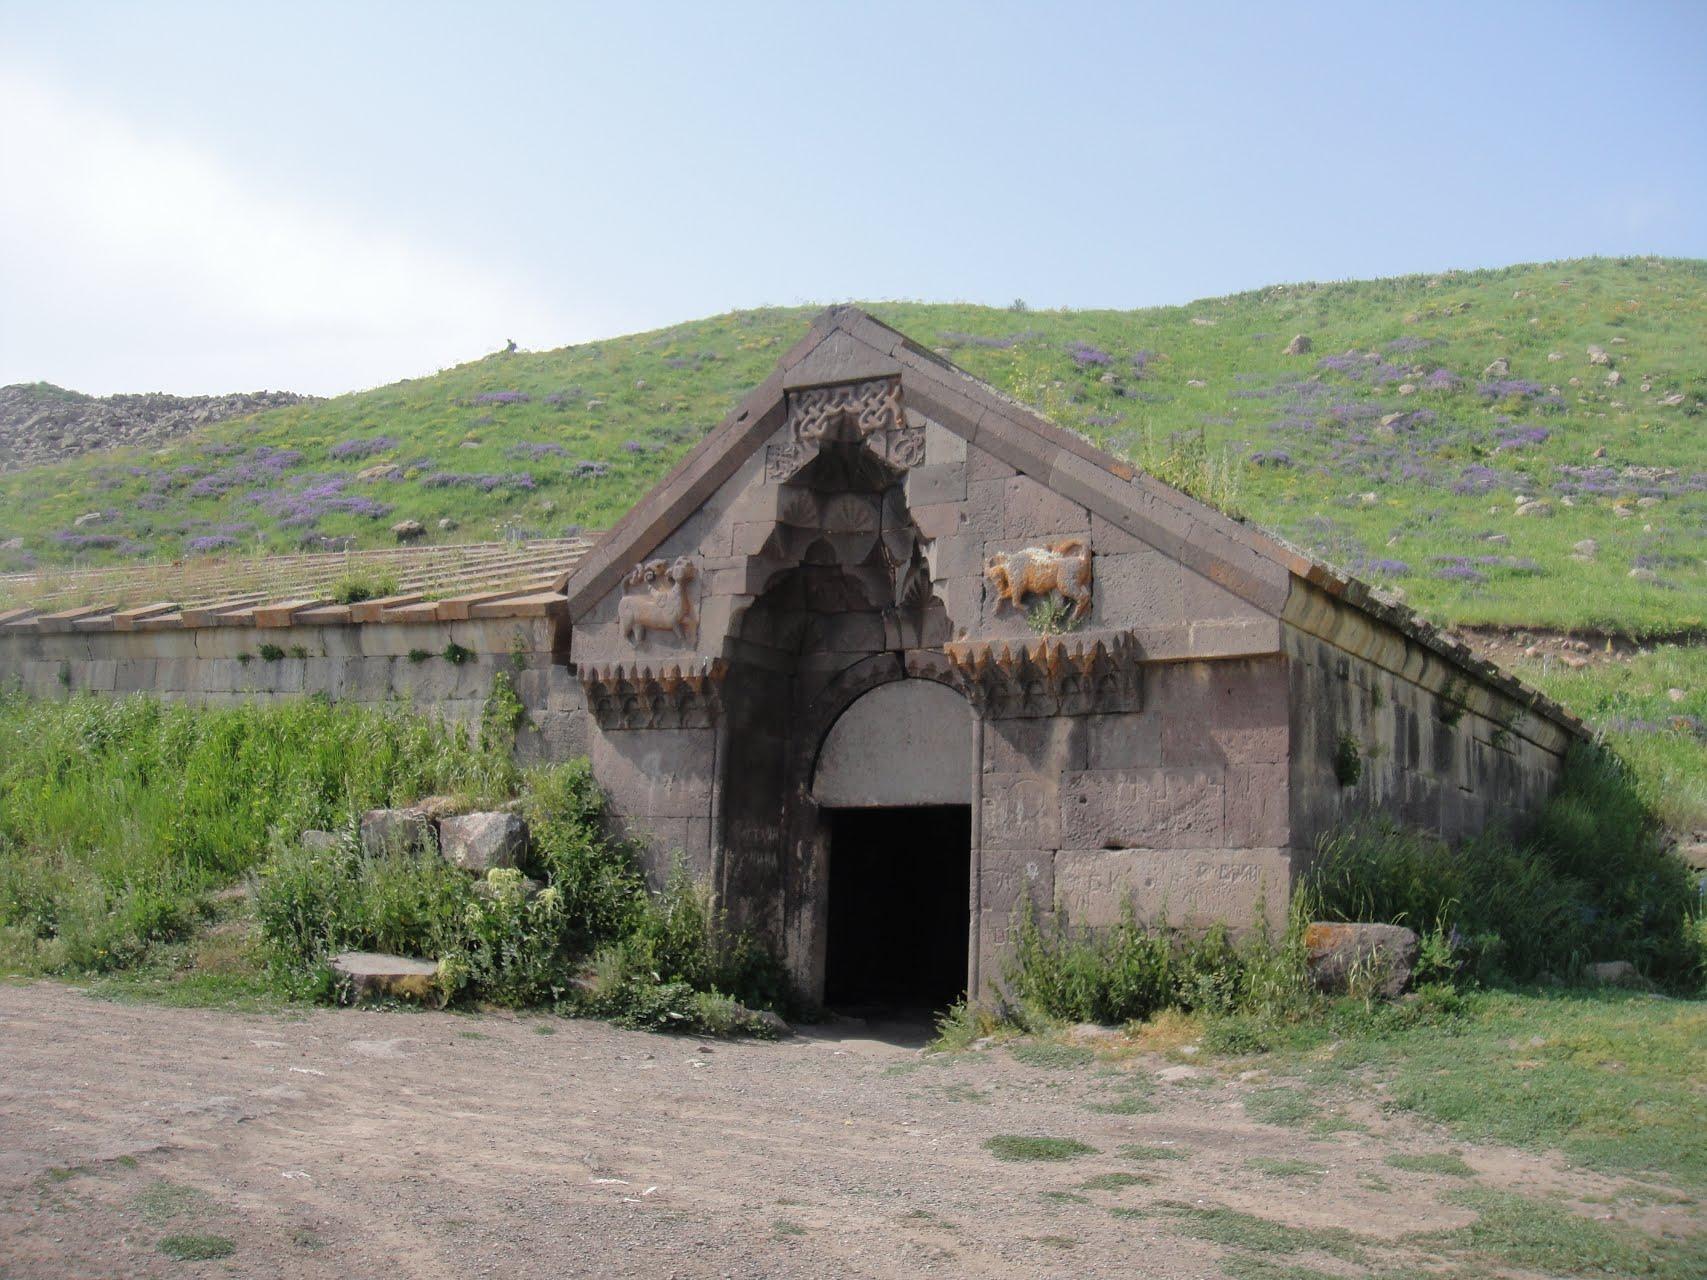 mysterious travelers at the caravanaserai